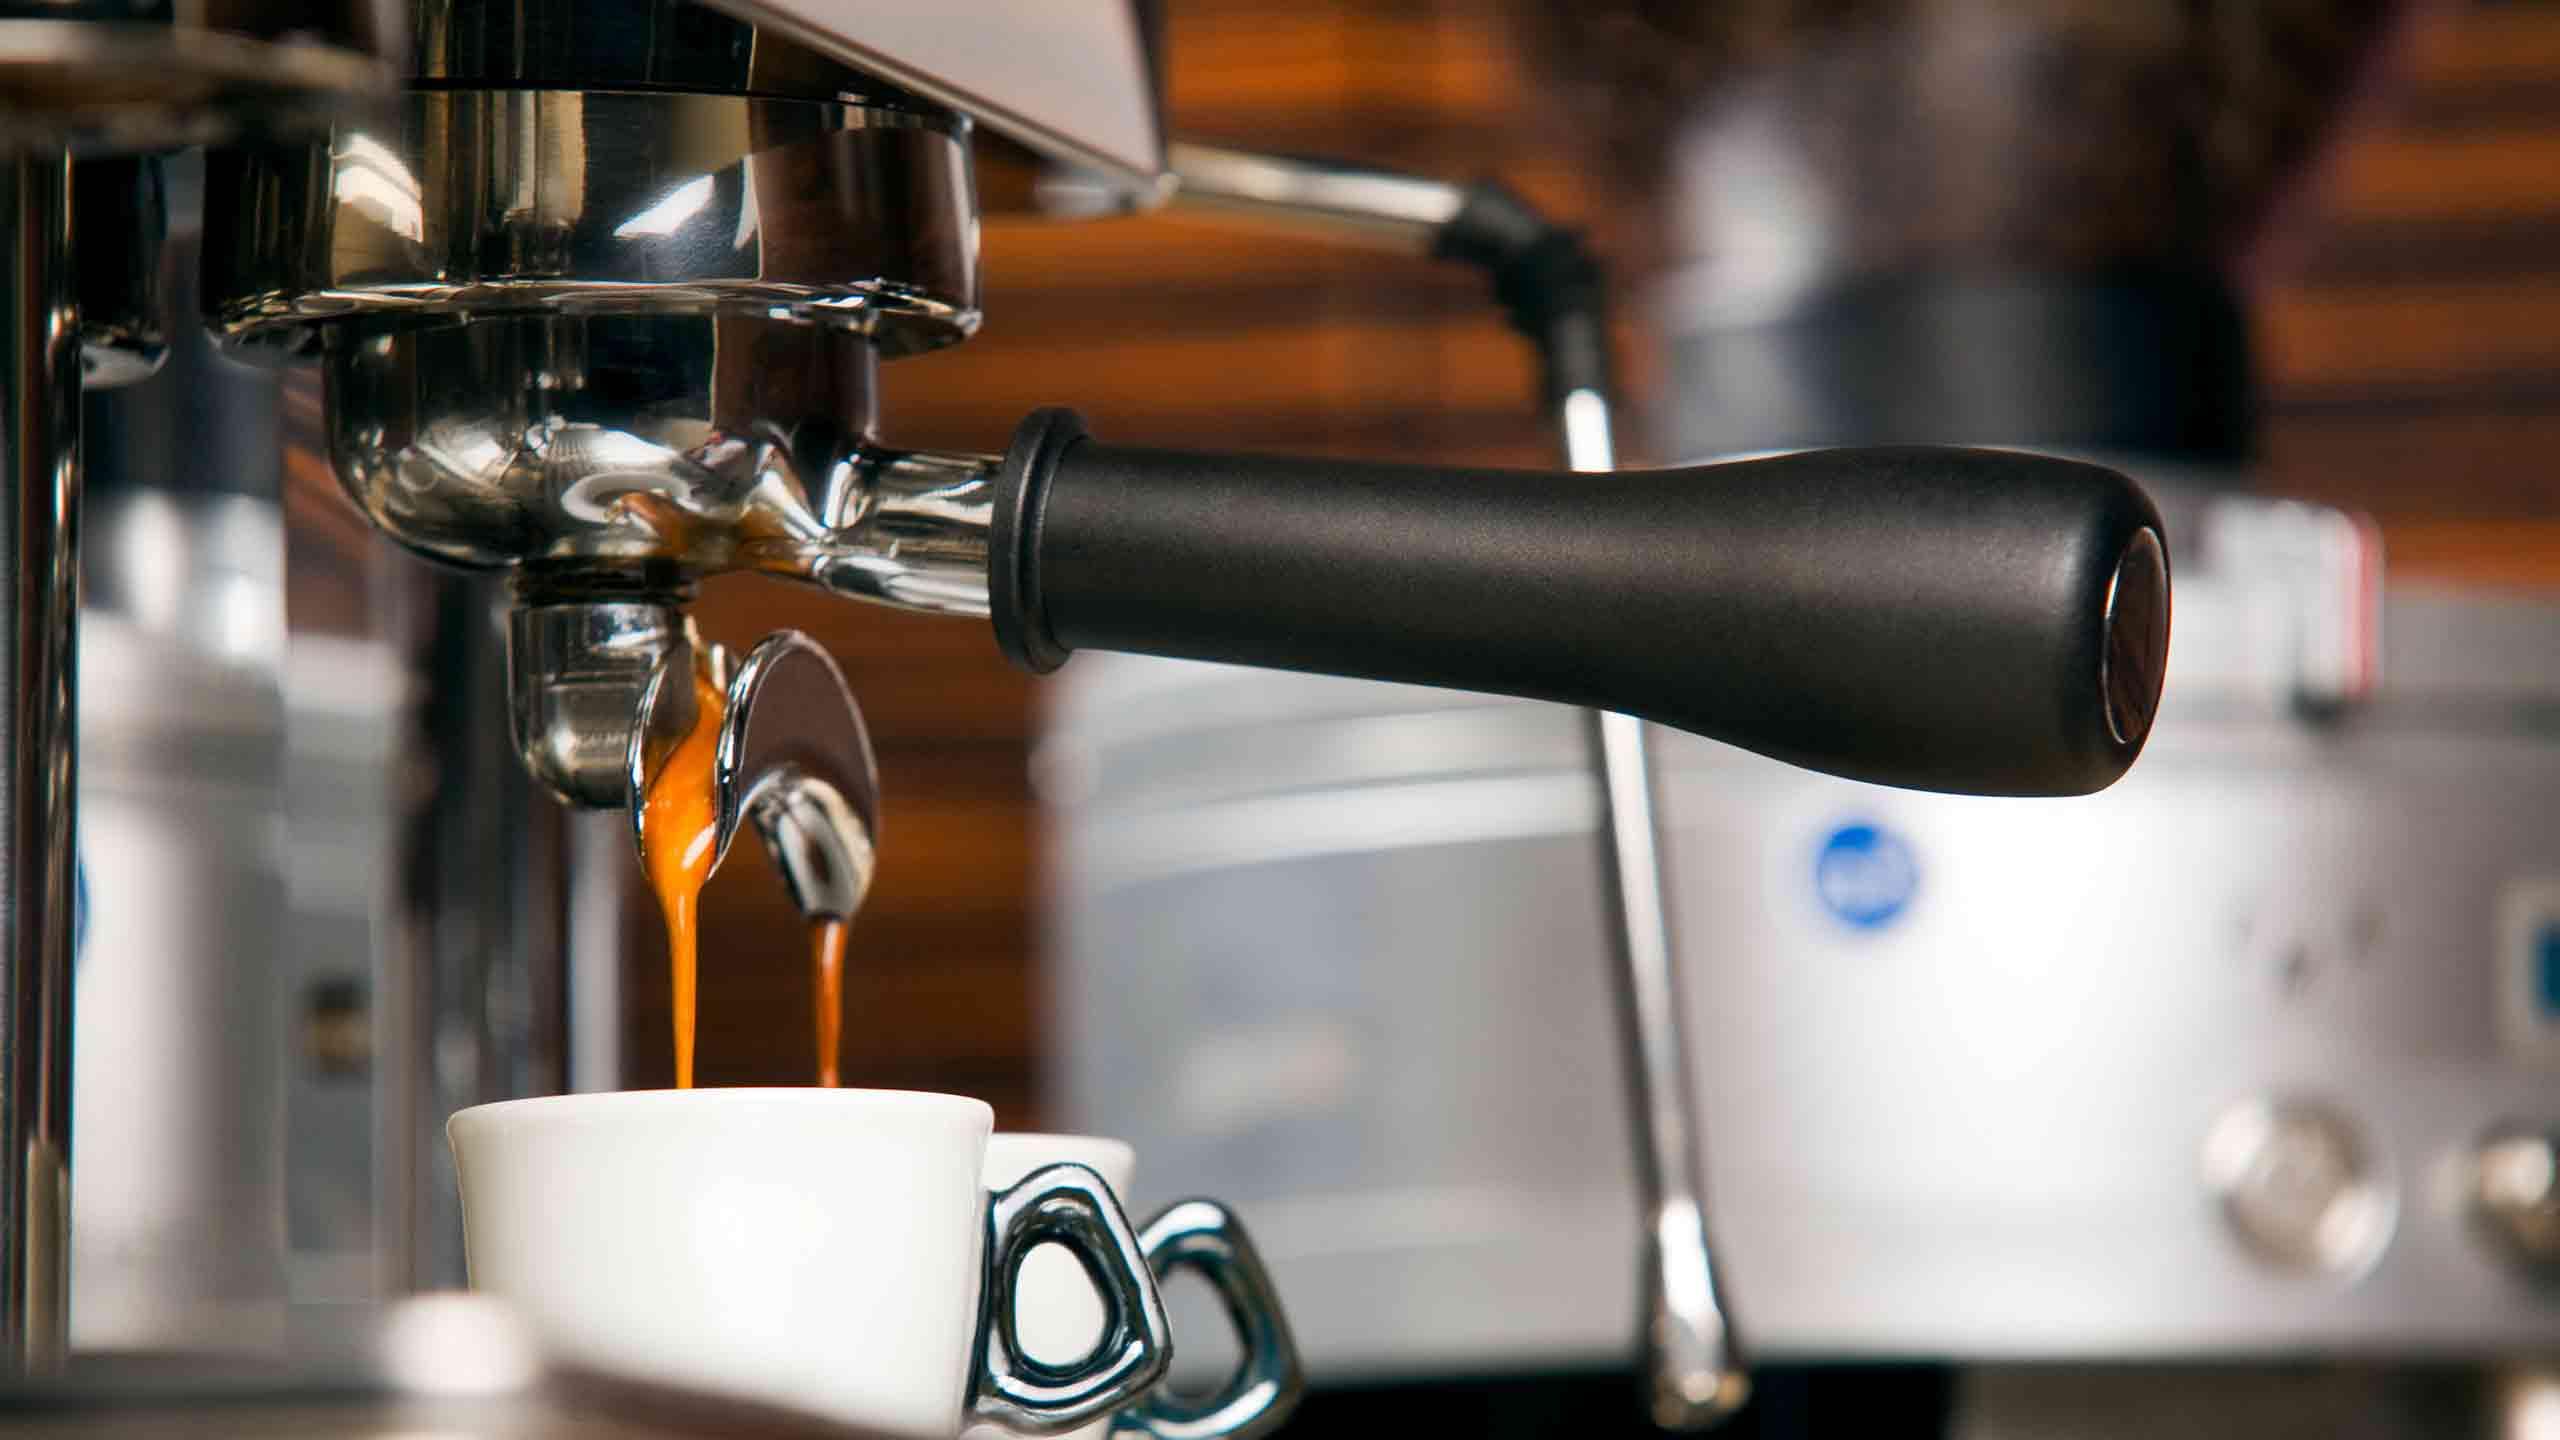 Espresso Wallpaper 2560x1440 66937